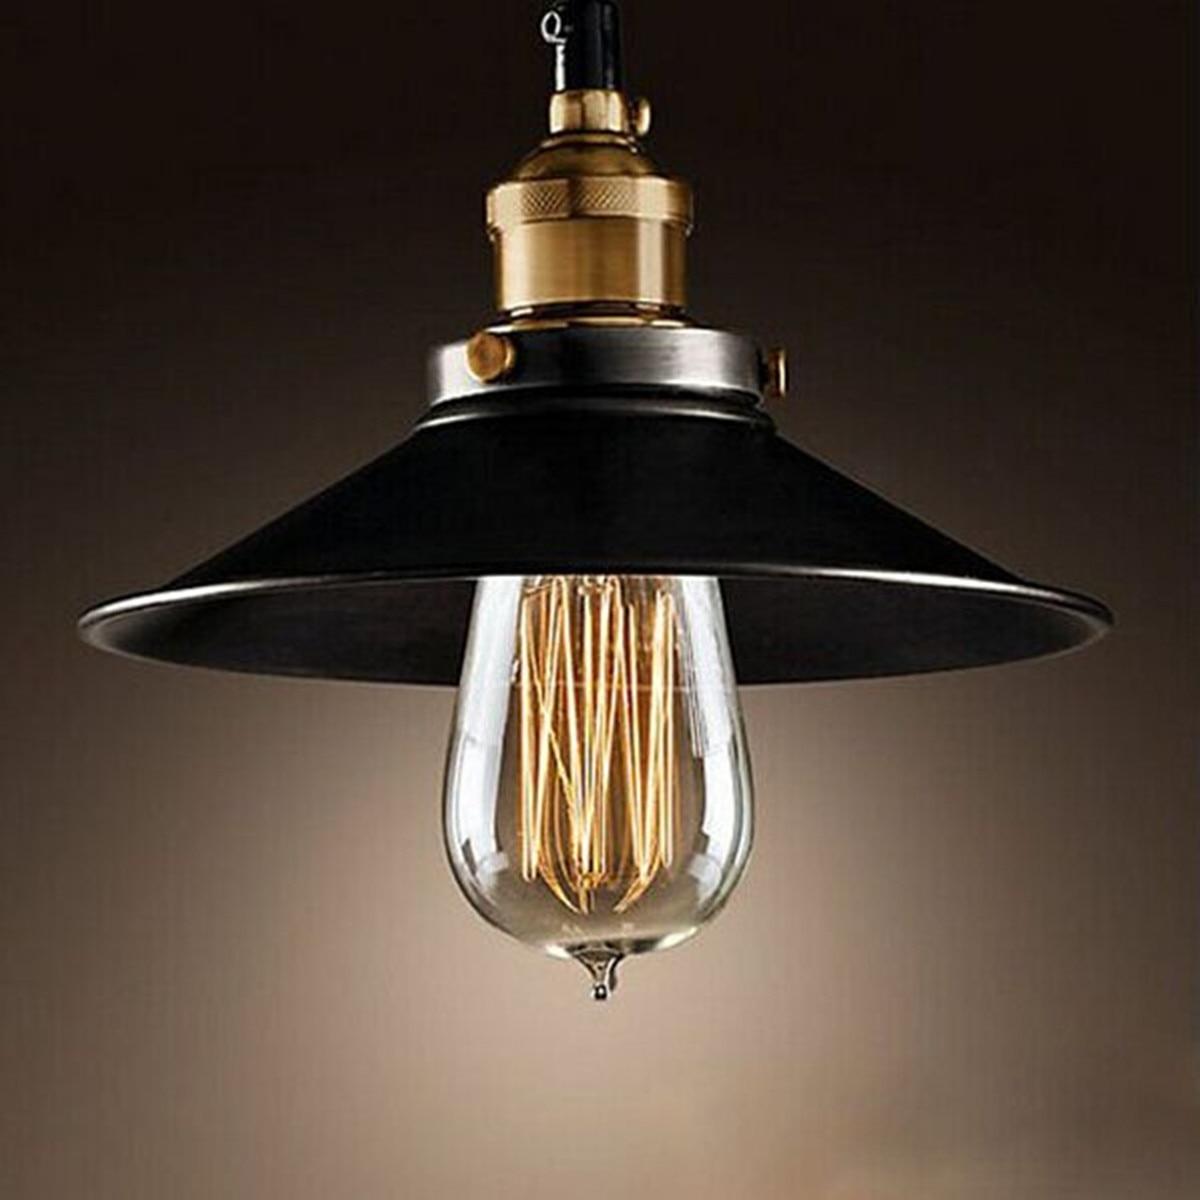 Smuxi Pendant Lights Vintage Industrial Retro Pendant Lamps Dining Room Lamp Restaurant Bar Counter Attic Lighting E27 Holder